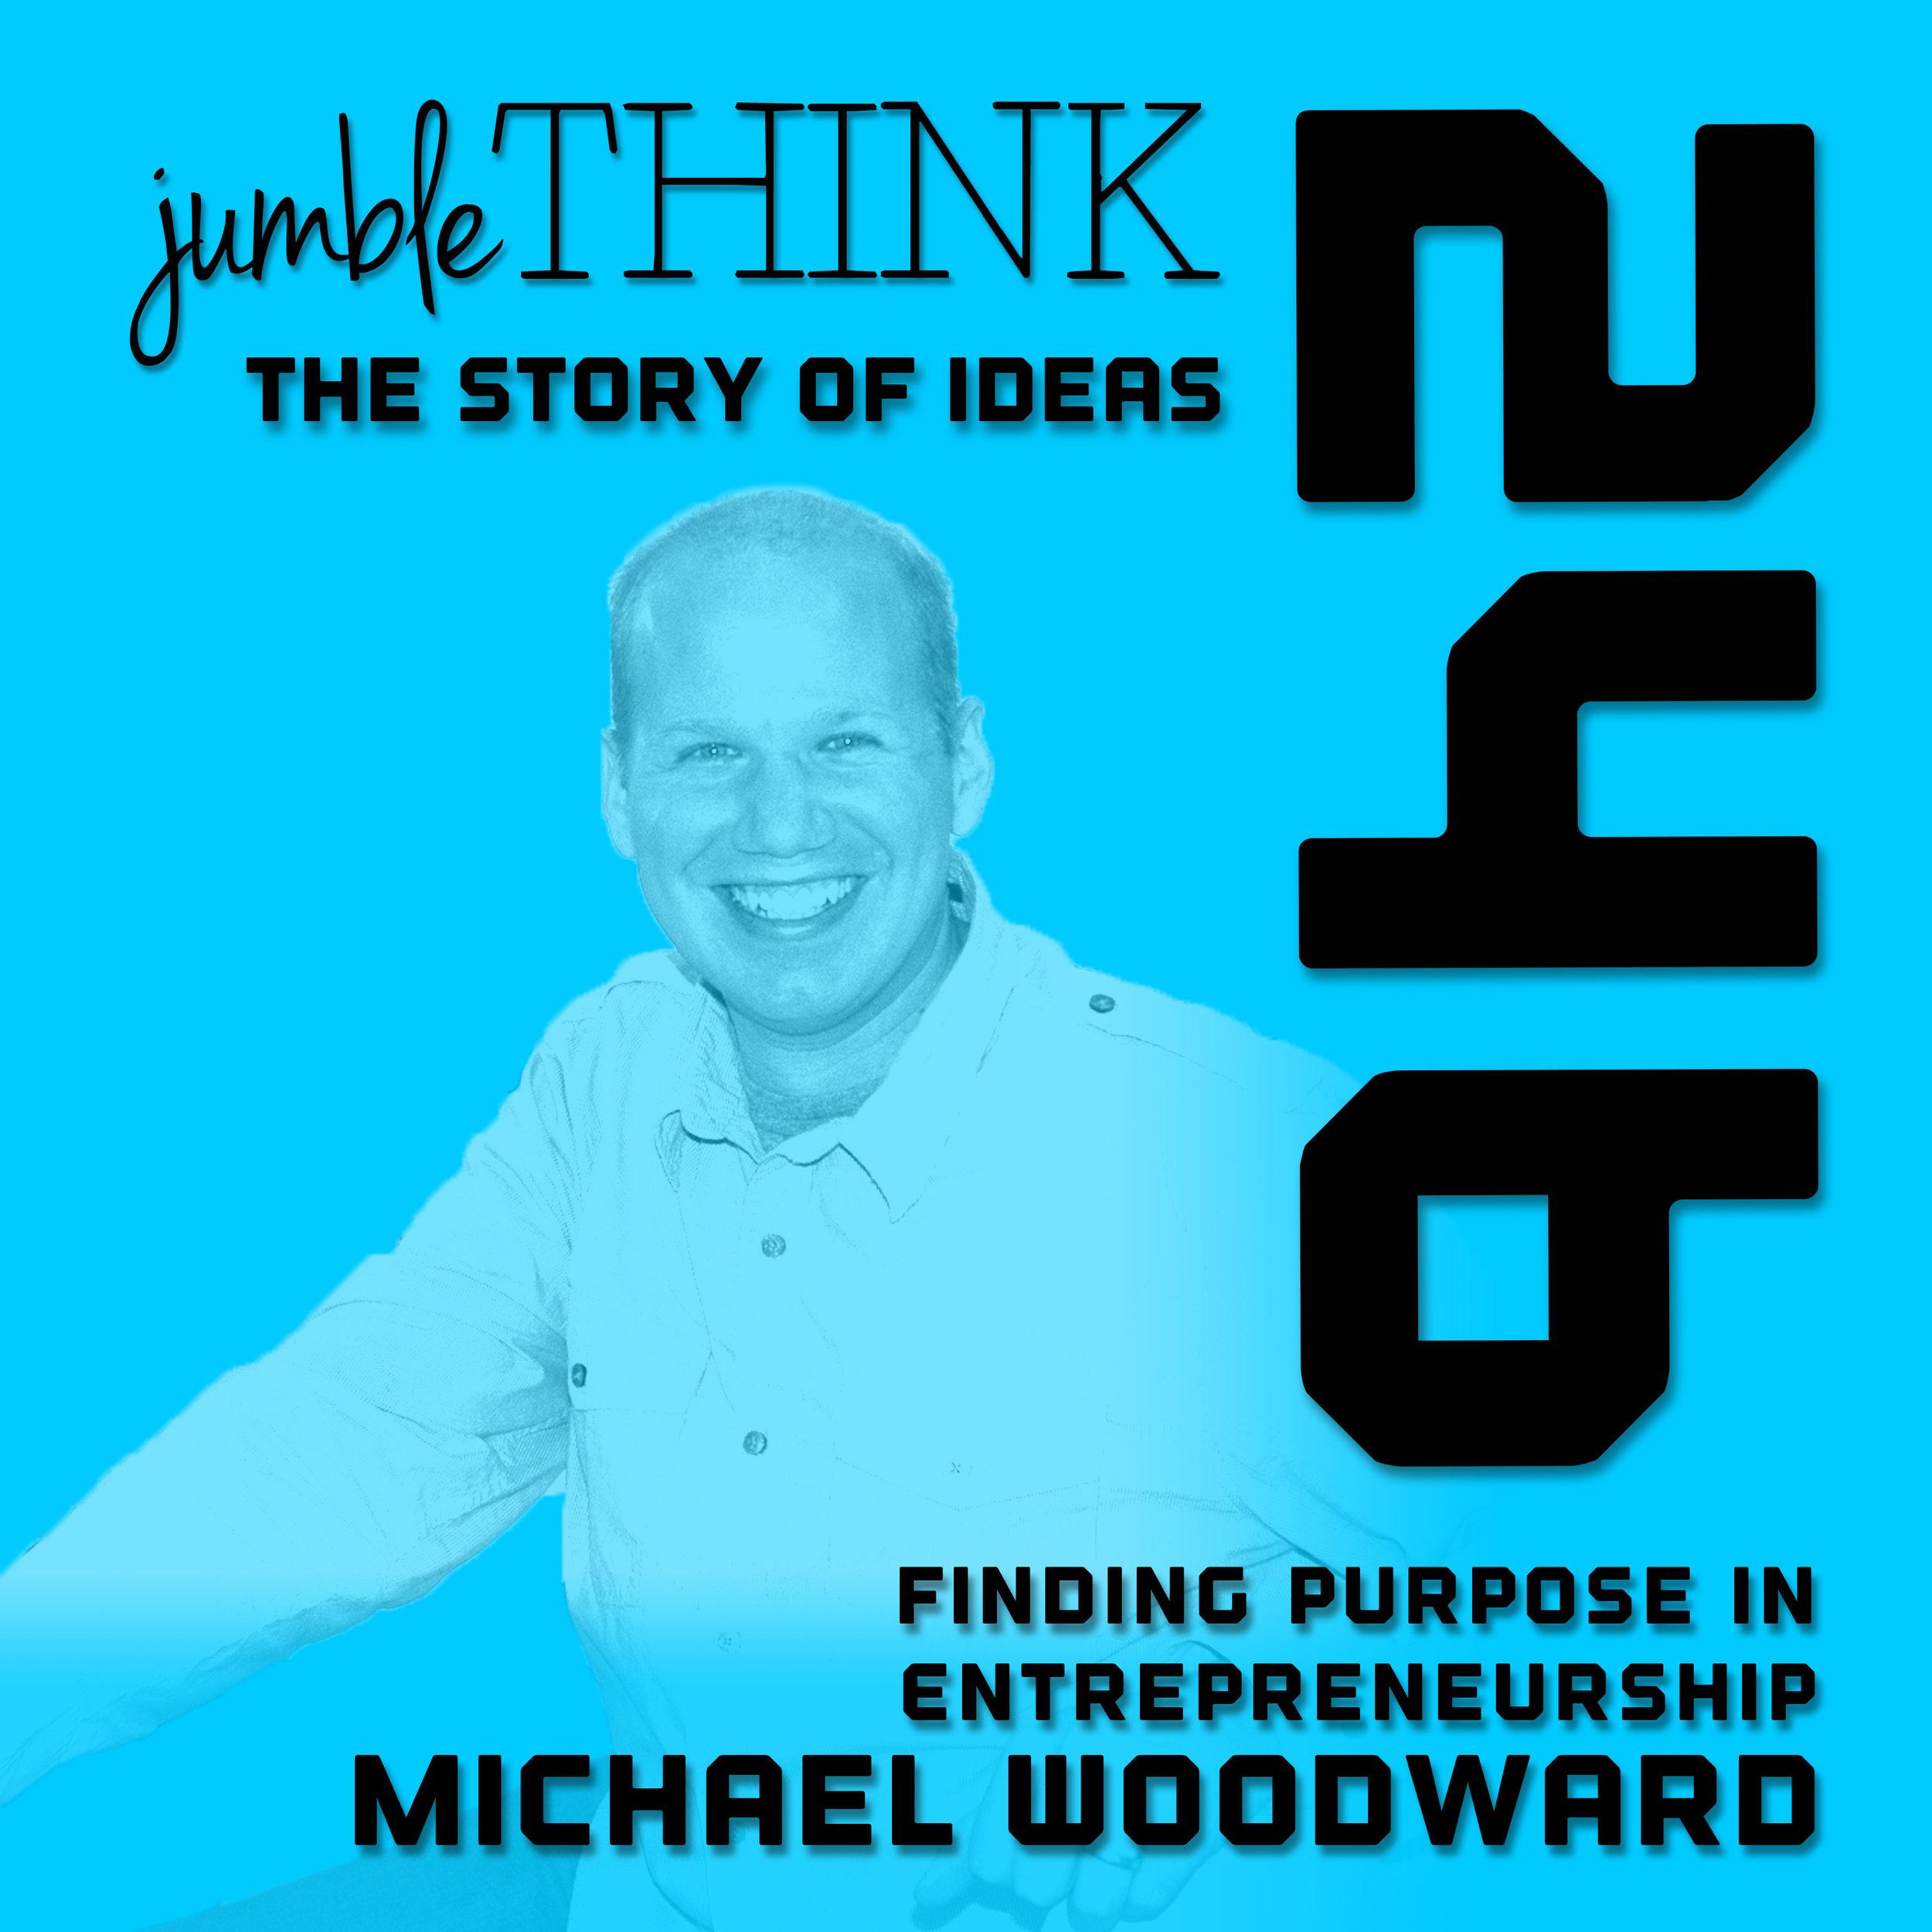 Finding Purpose in Entrepreneurship